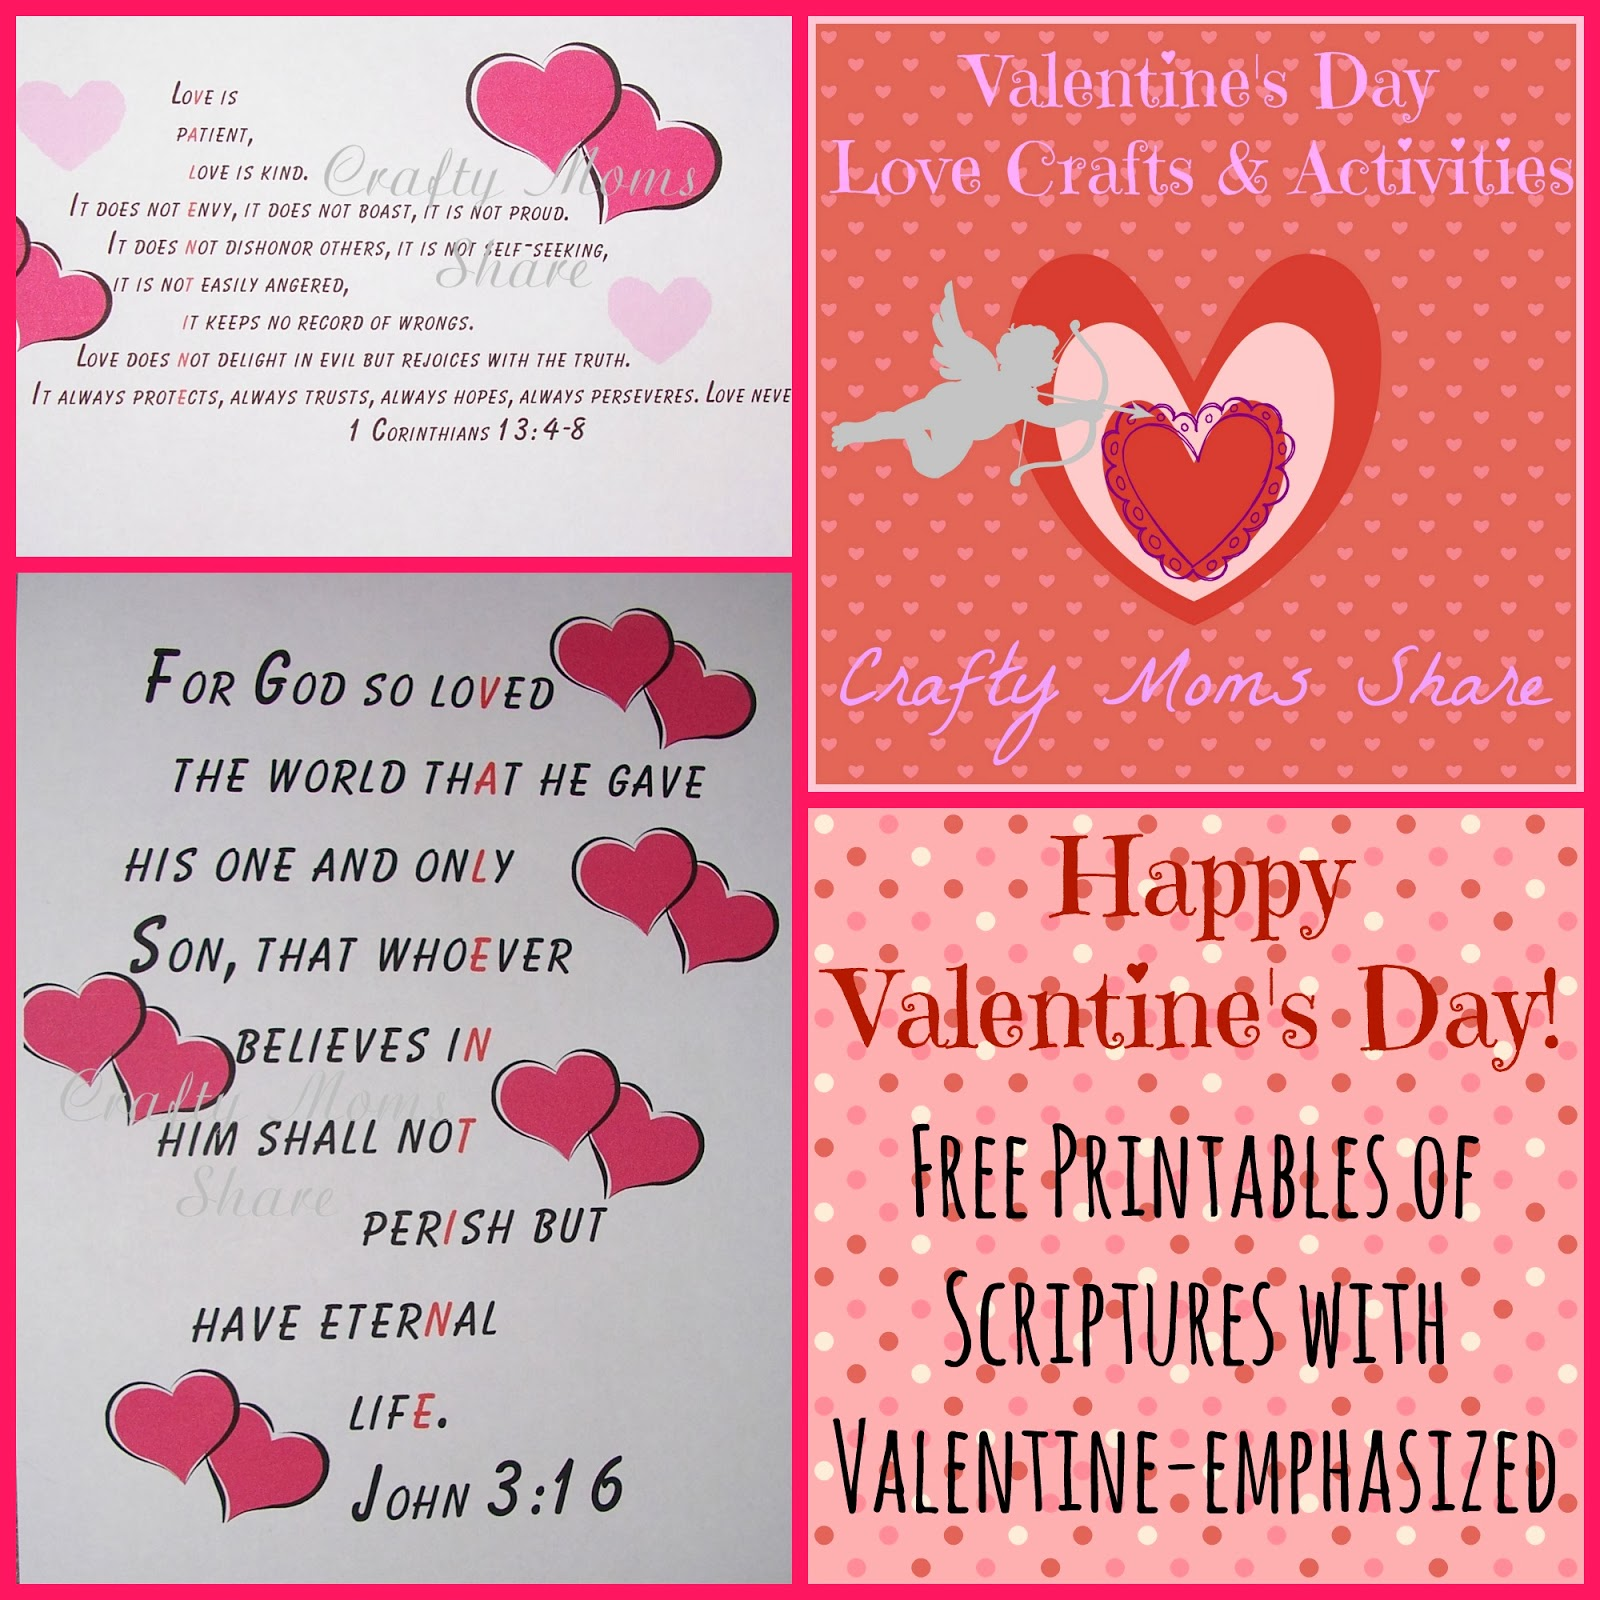 Crafty Moms Share Free Valentine Emphasized Scripture Printables